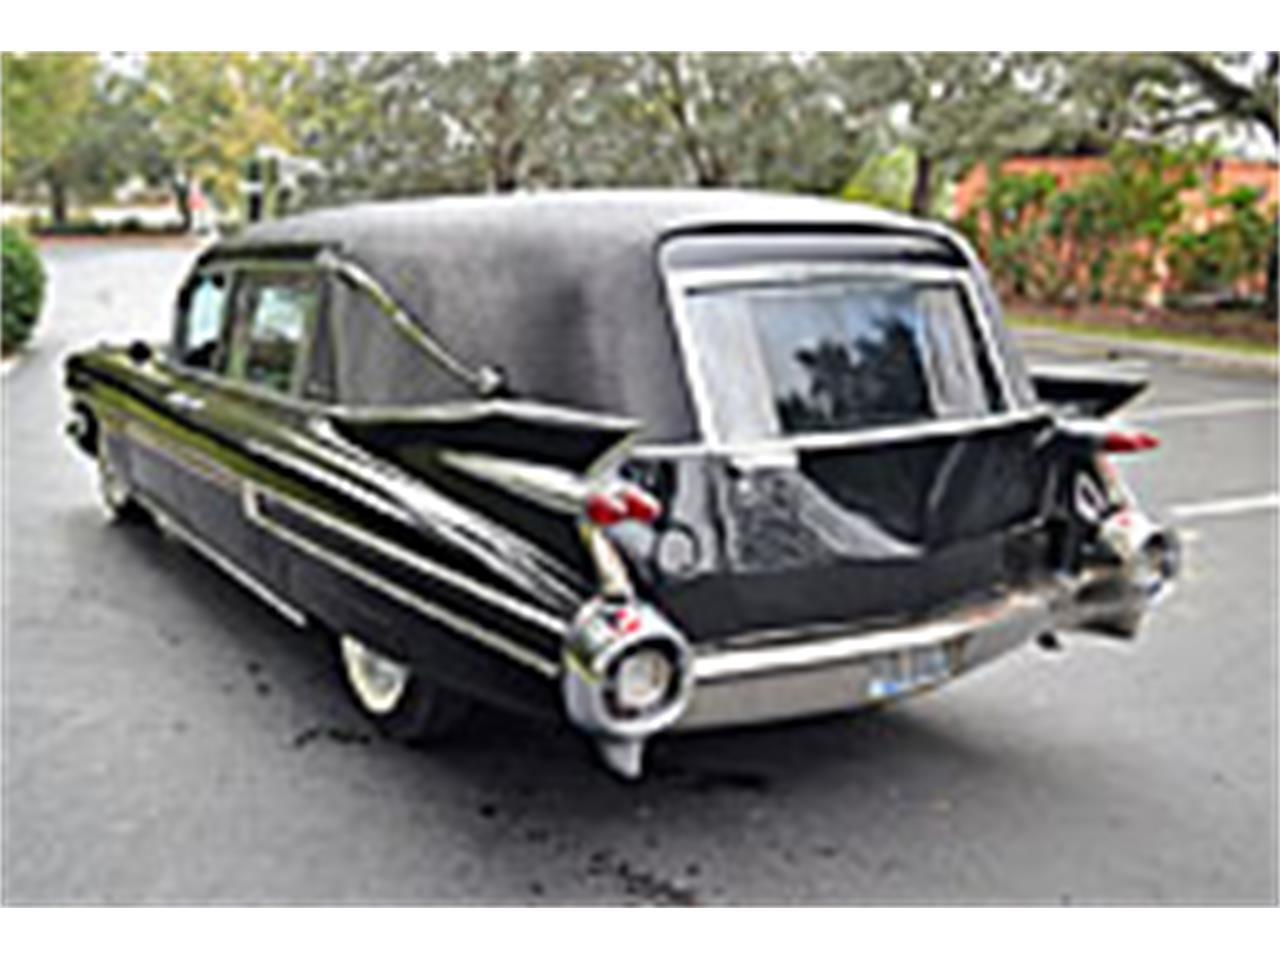 1959 cadillac ss landau victoria 3 way hearse for sale large picture of 59 ss landau victoria 3 way hearse l84b izmirmasajfo